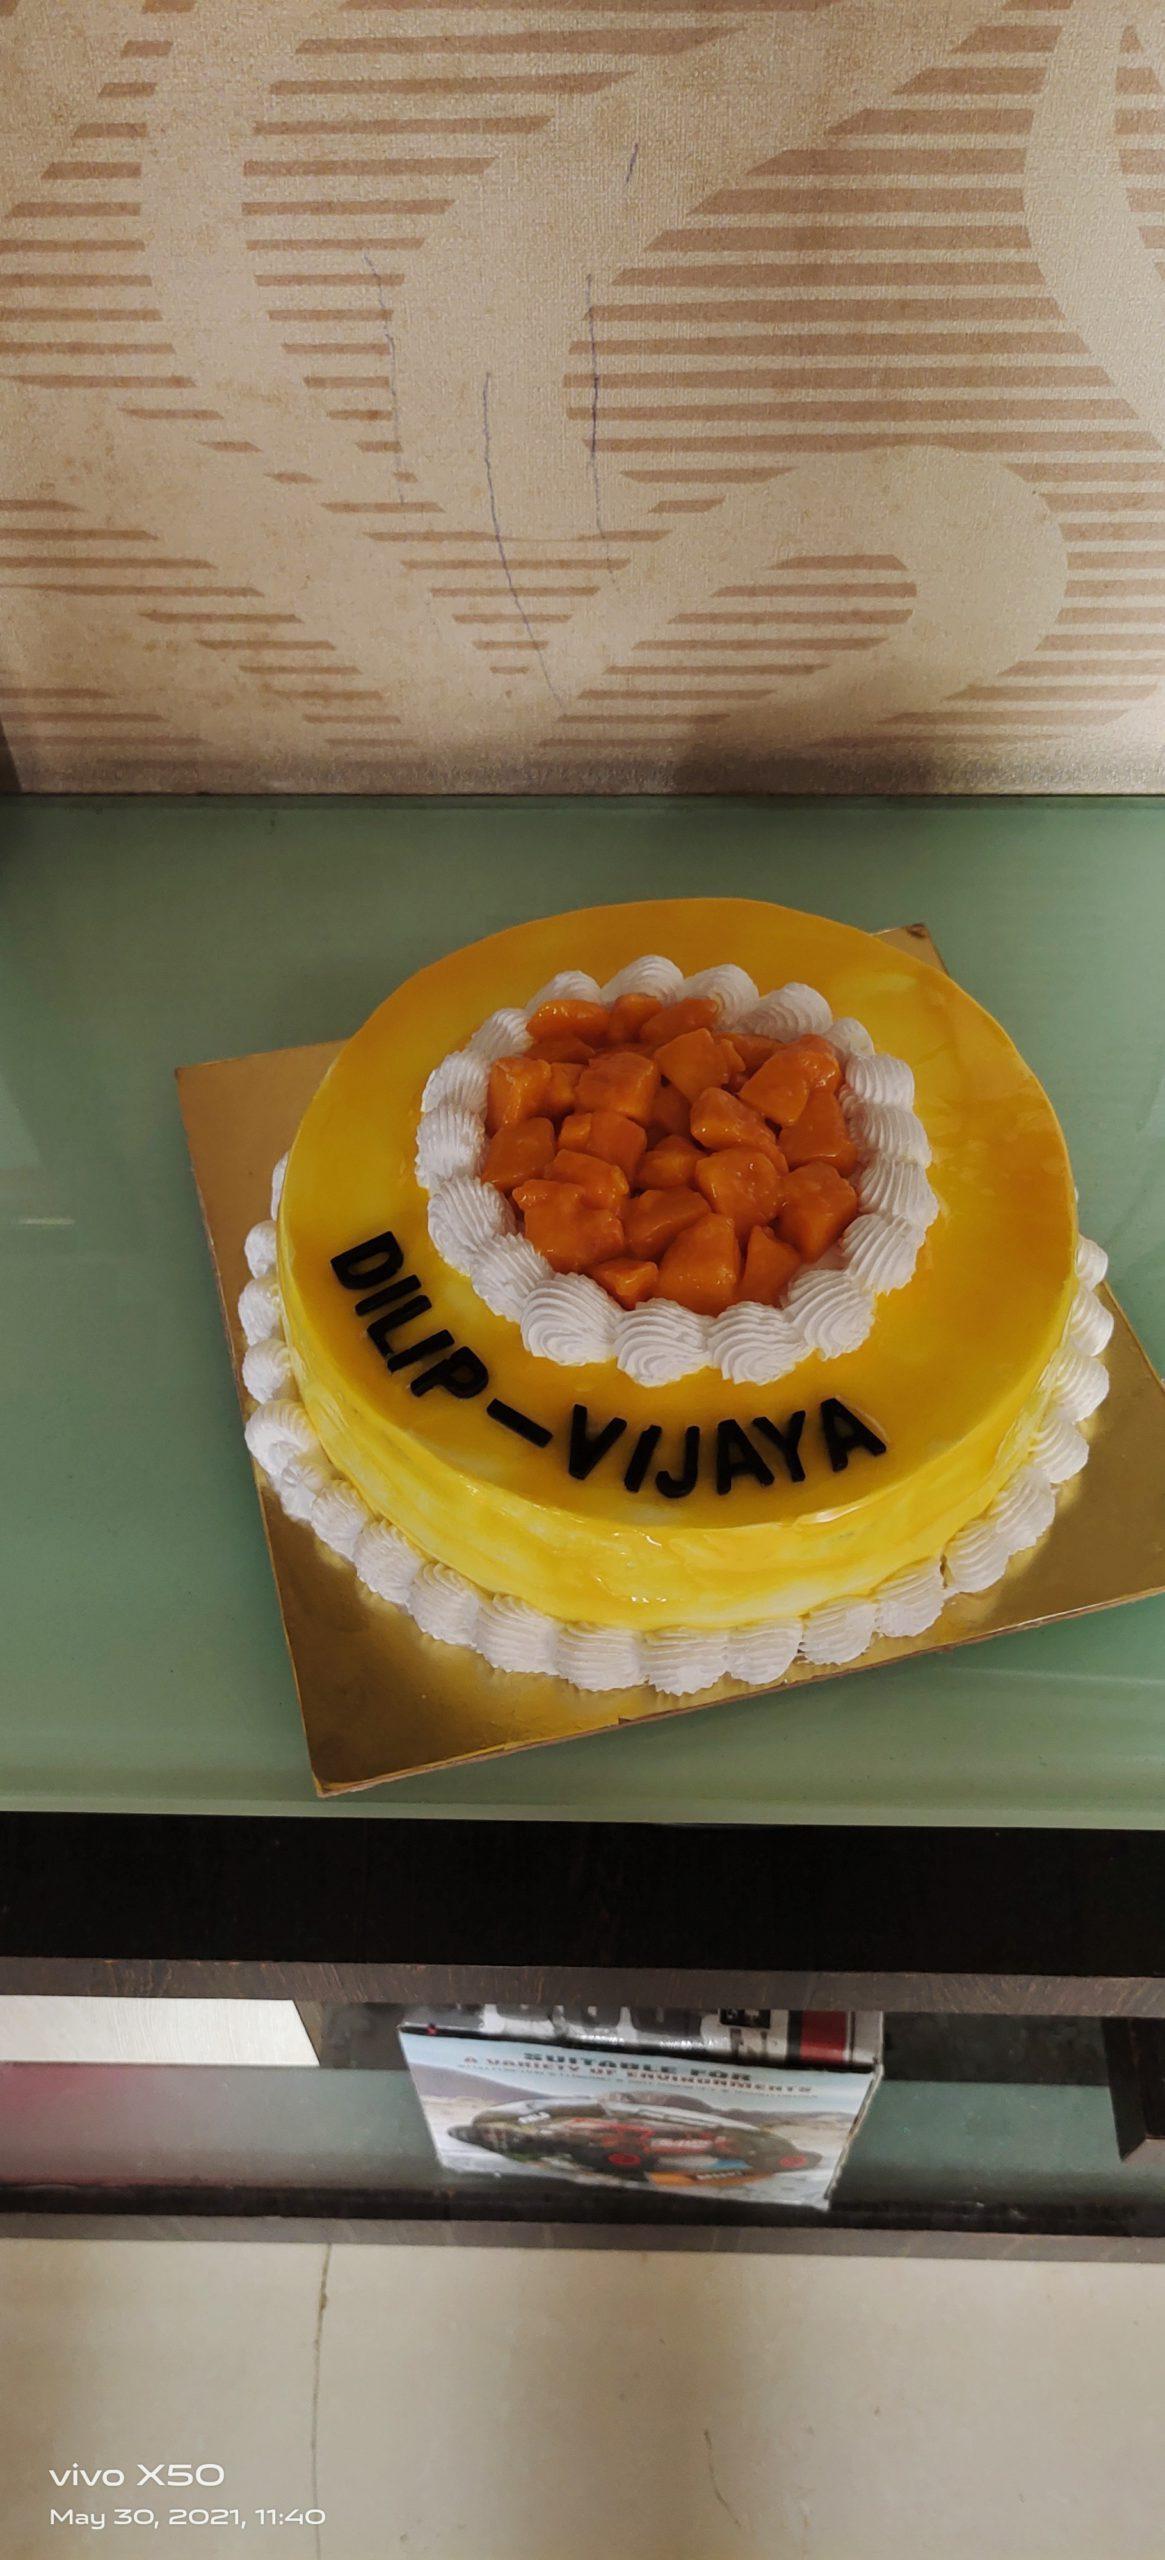 Alphanso Mango Cake Designs, Images, Price Near Me